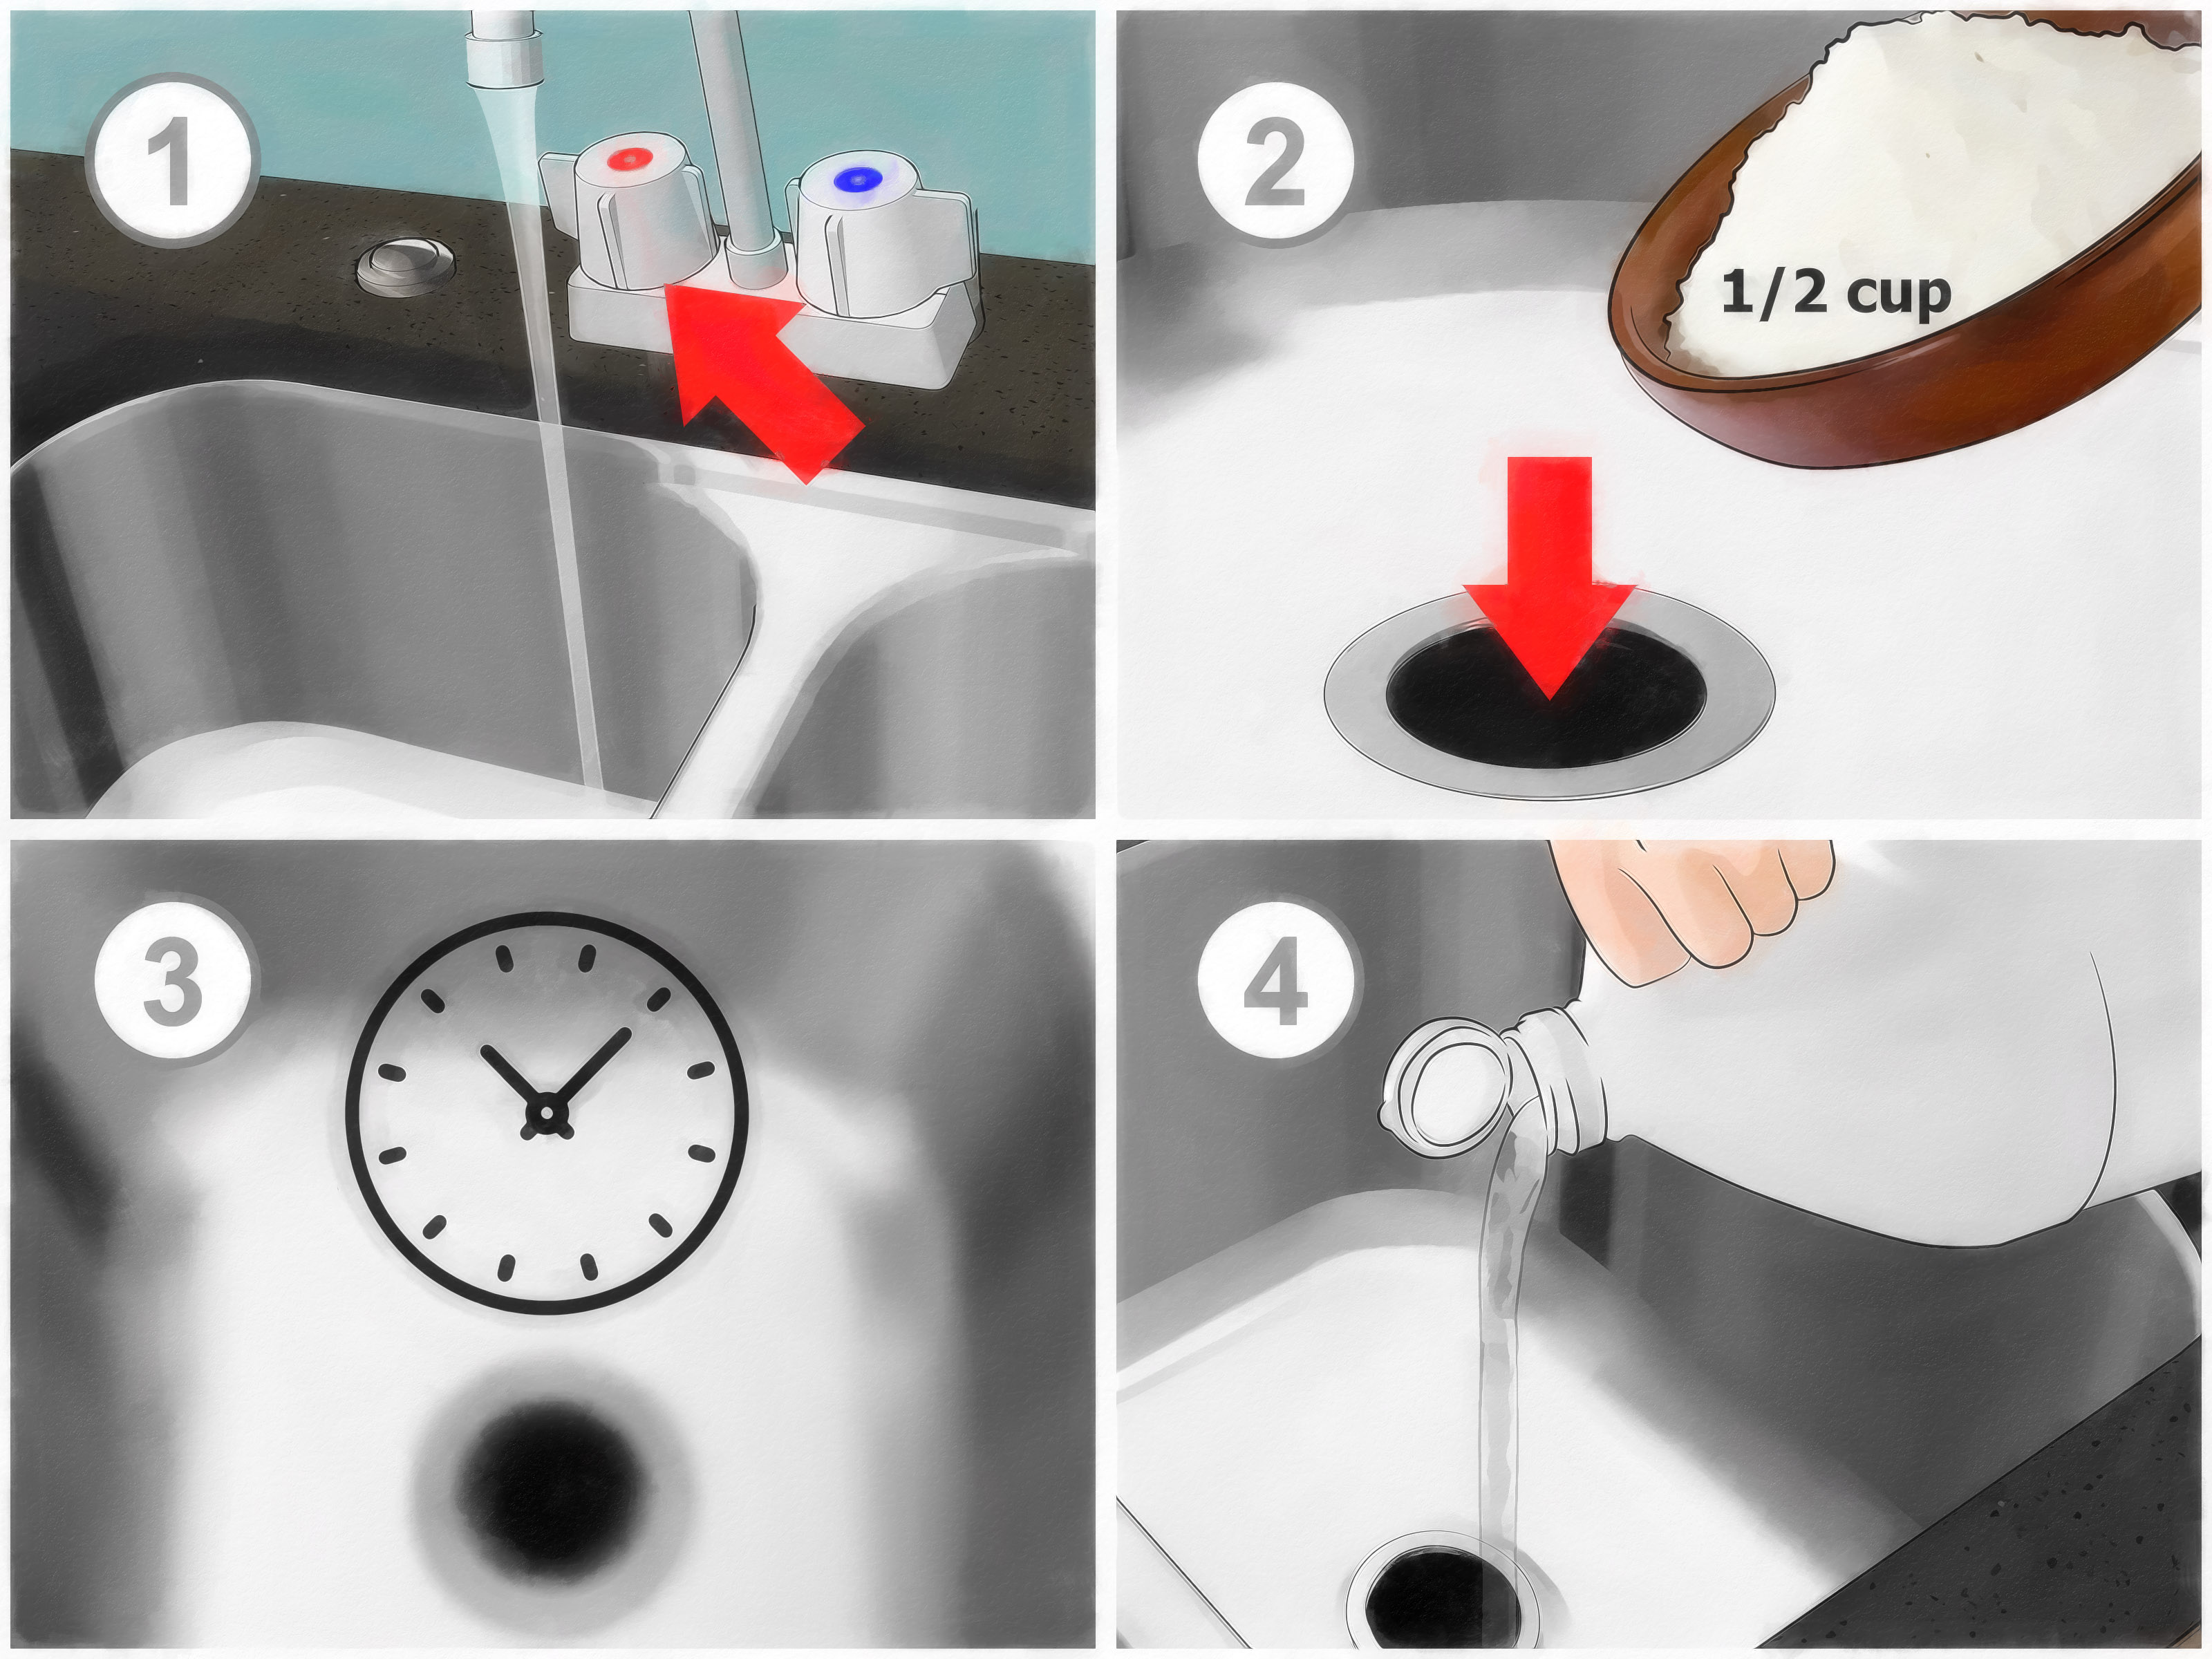 Unclog a Sink clogged kitchen sink Unclog a Garbage Disposal